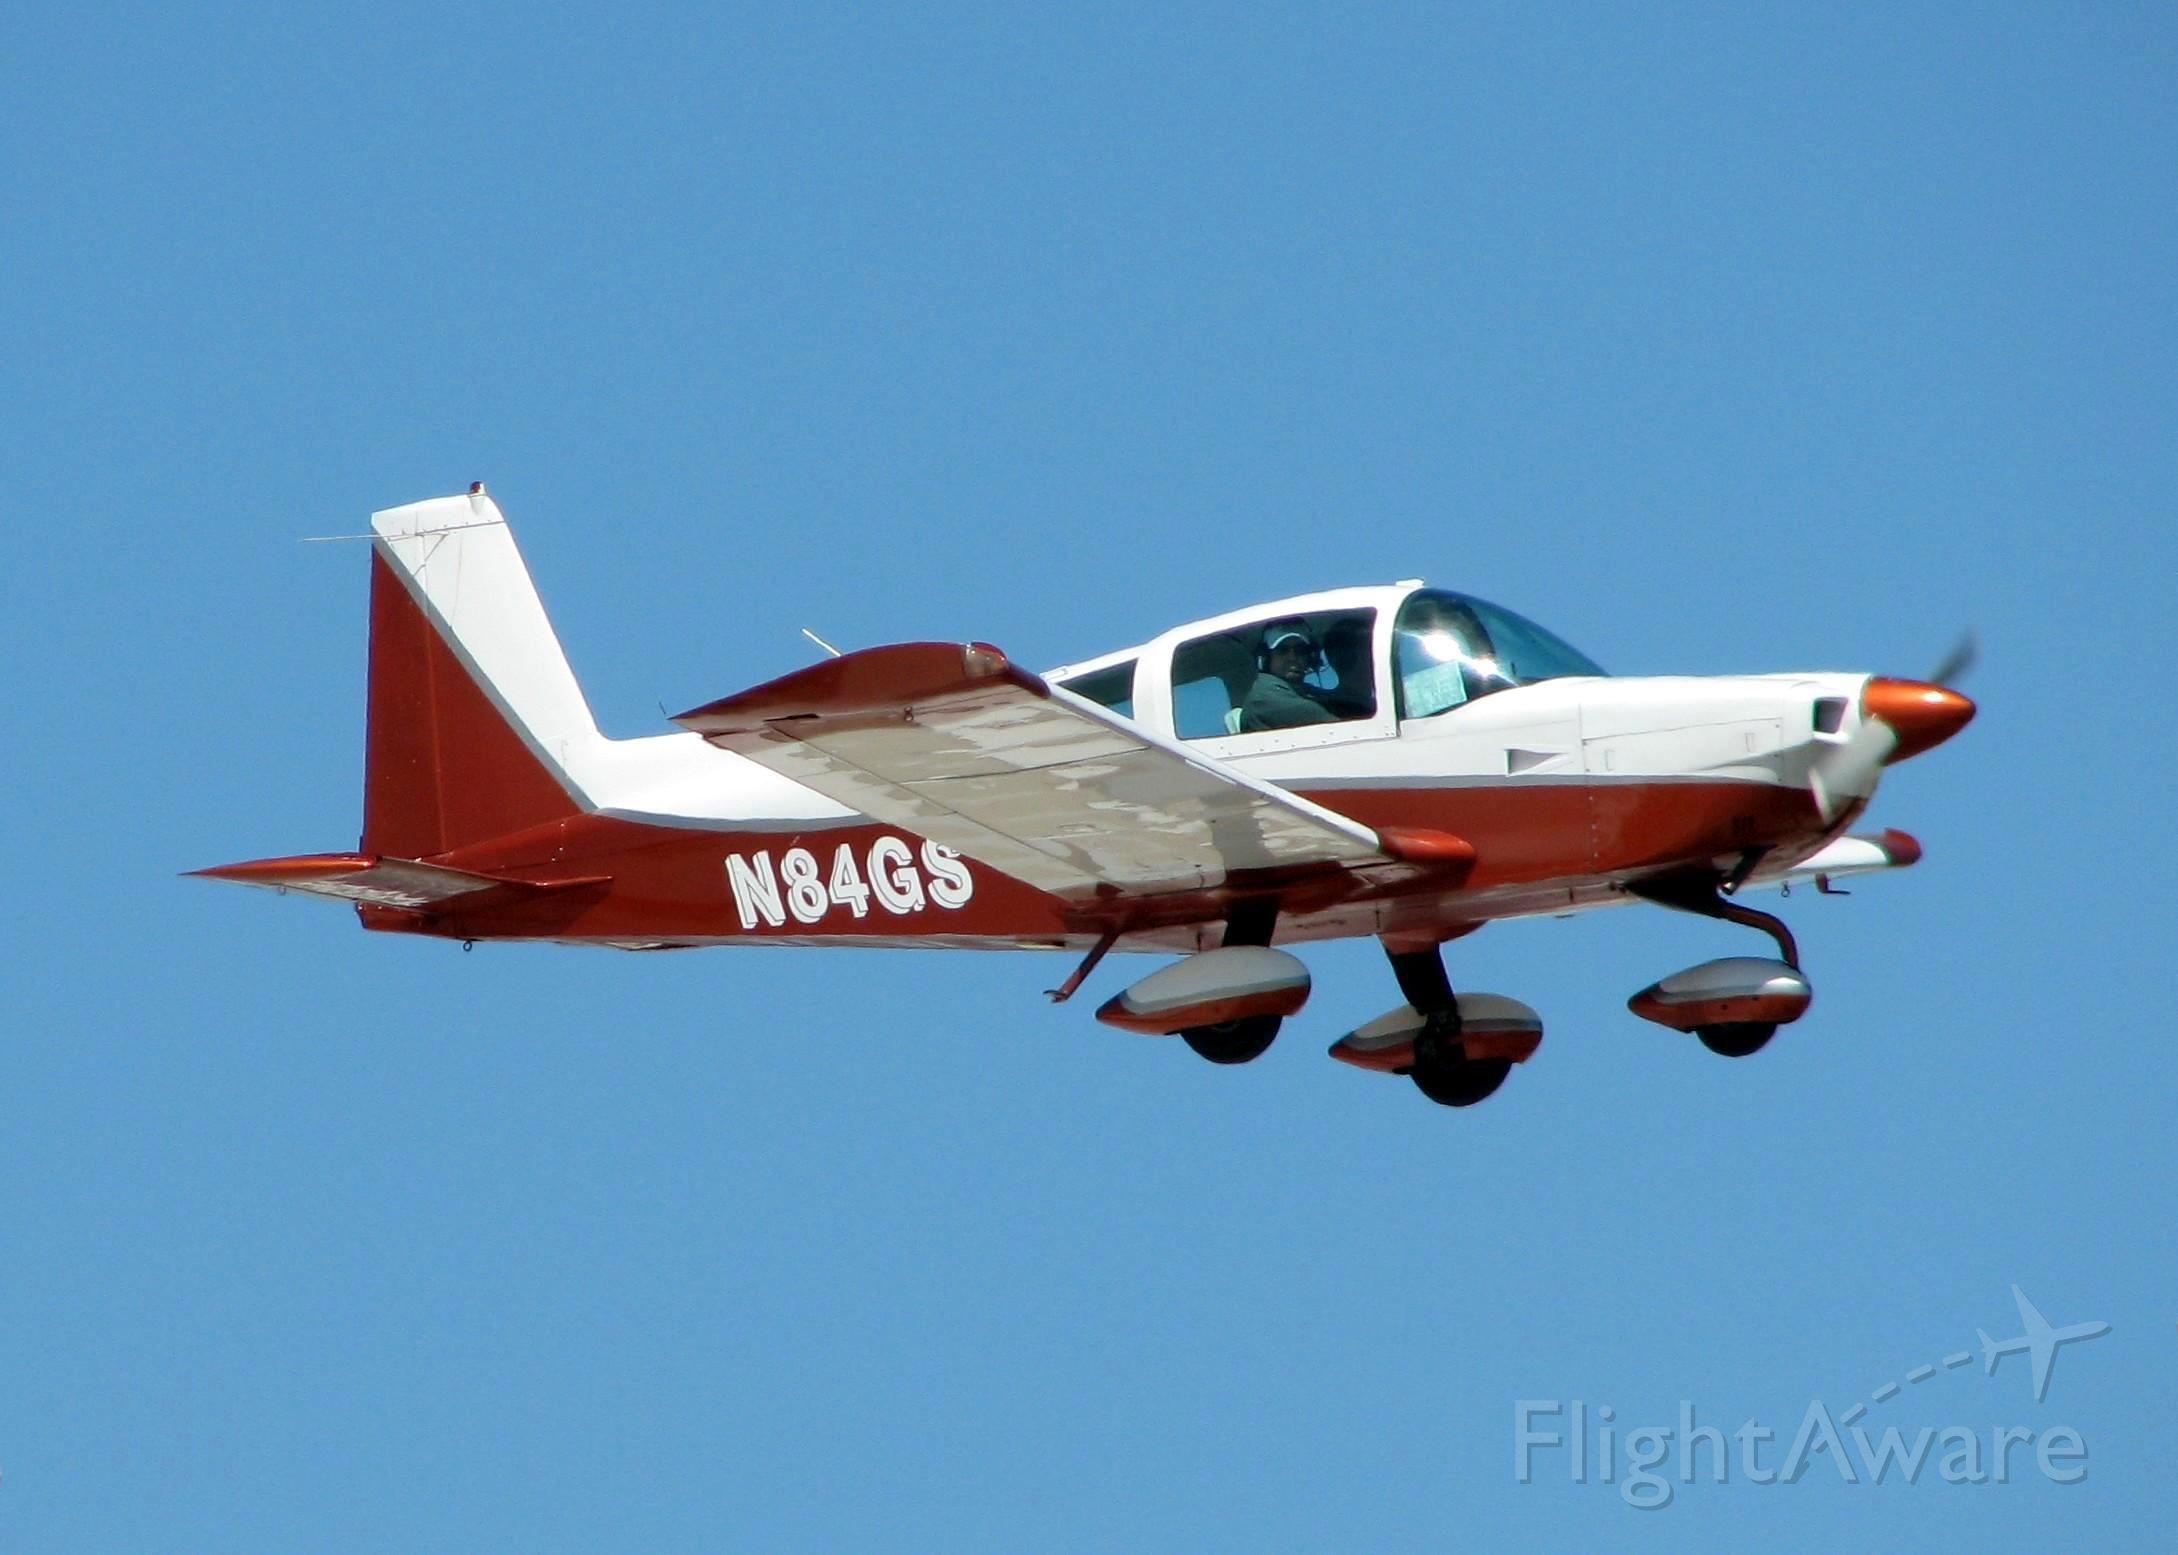 Grumman AA-5 Tiger (N84GS) - Landing at Shreveports Downtown Airport.